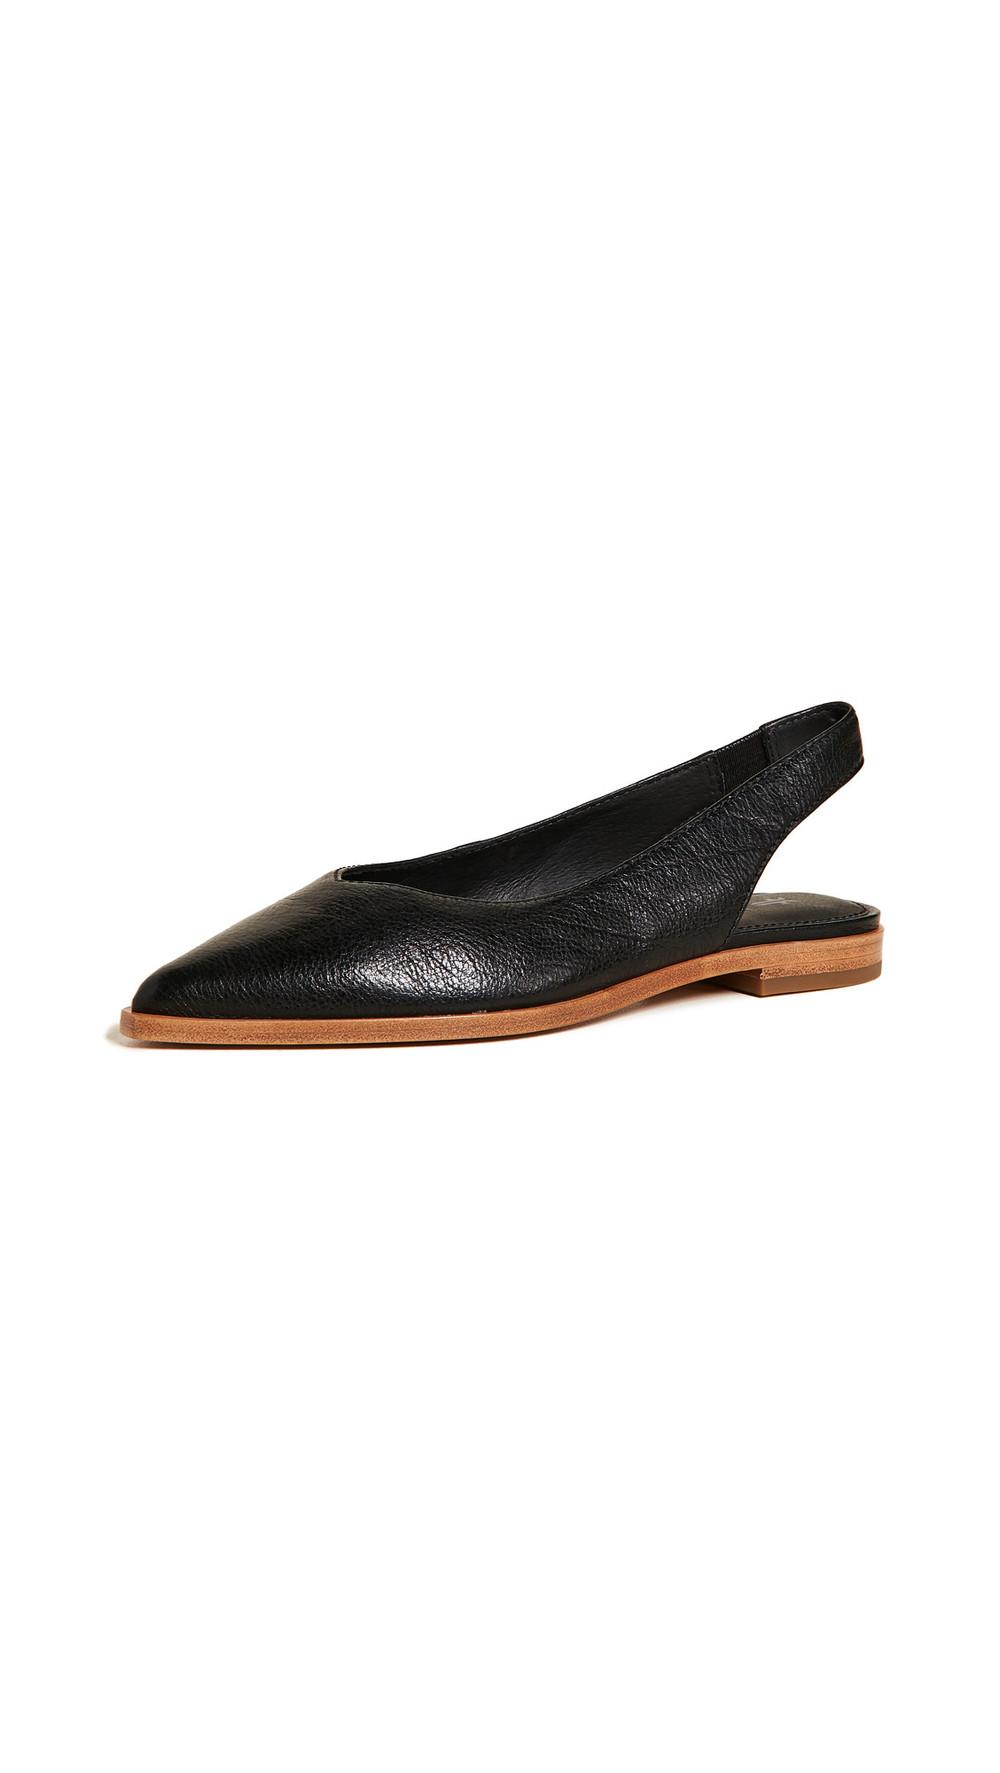 Frye Kenzie Slingback Flats in black